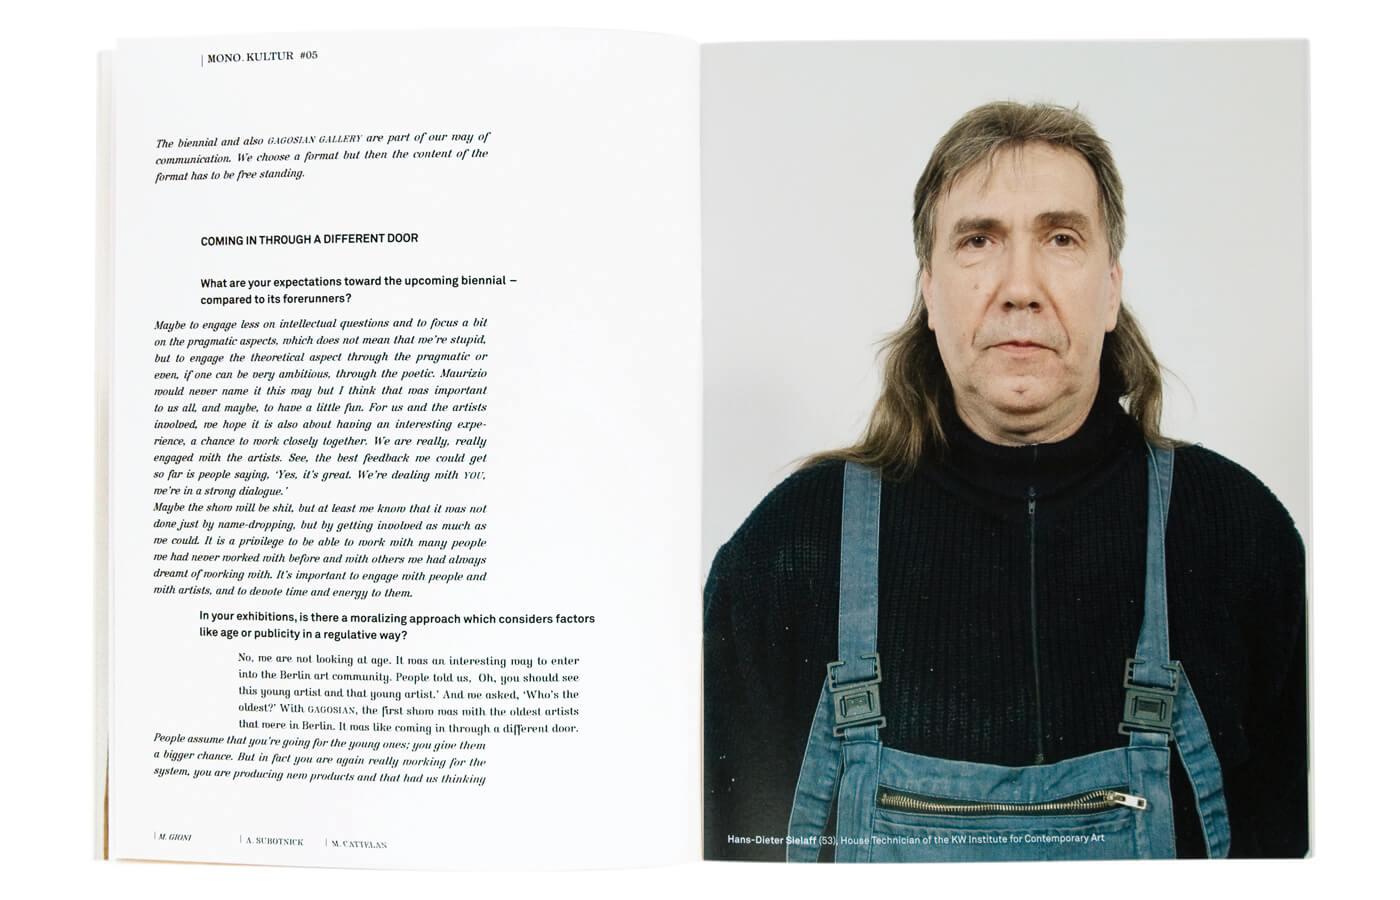 mono.kultur #05, Maurizio Cattelan, Massimiliano Gioni, Ali Subotnick: Falling And Walking Ahead